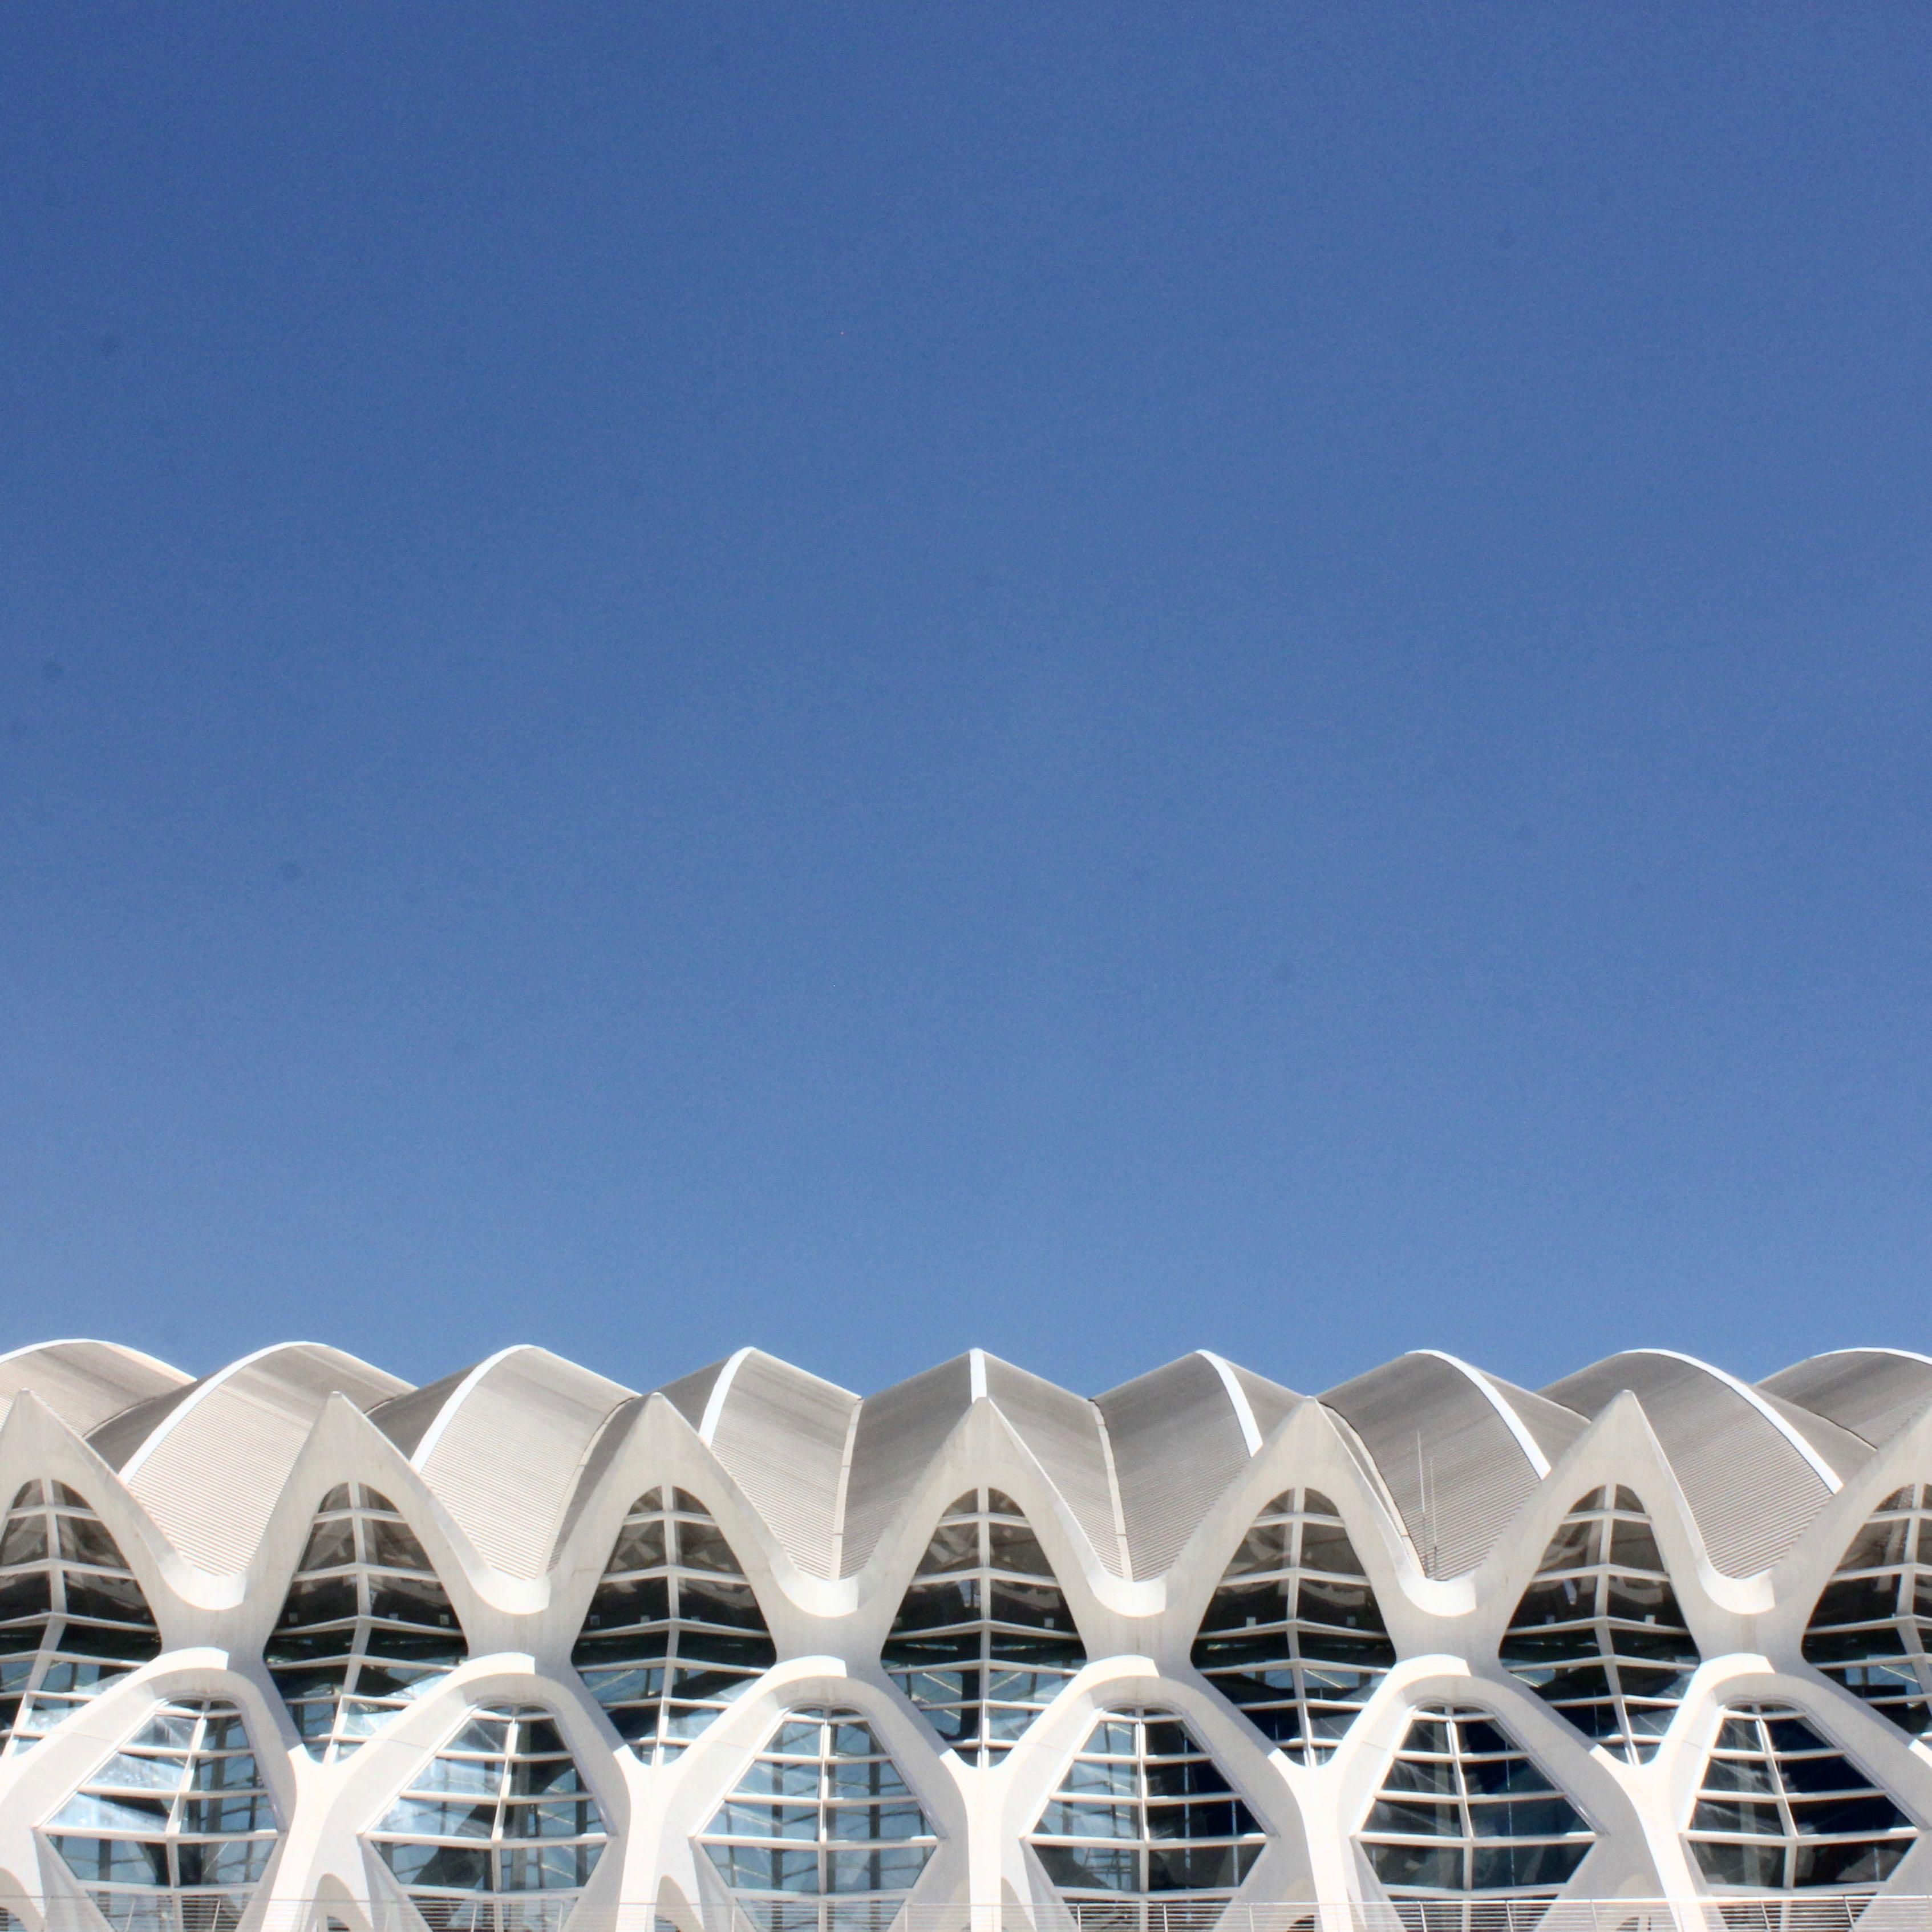 Valencia, Spain Calatrava 2